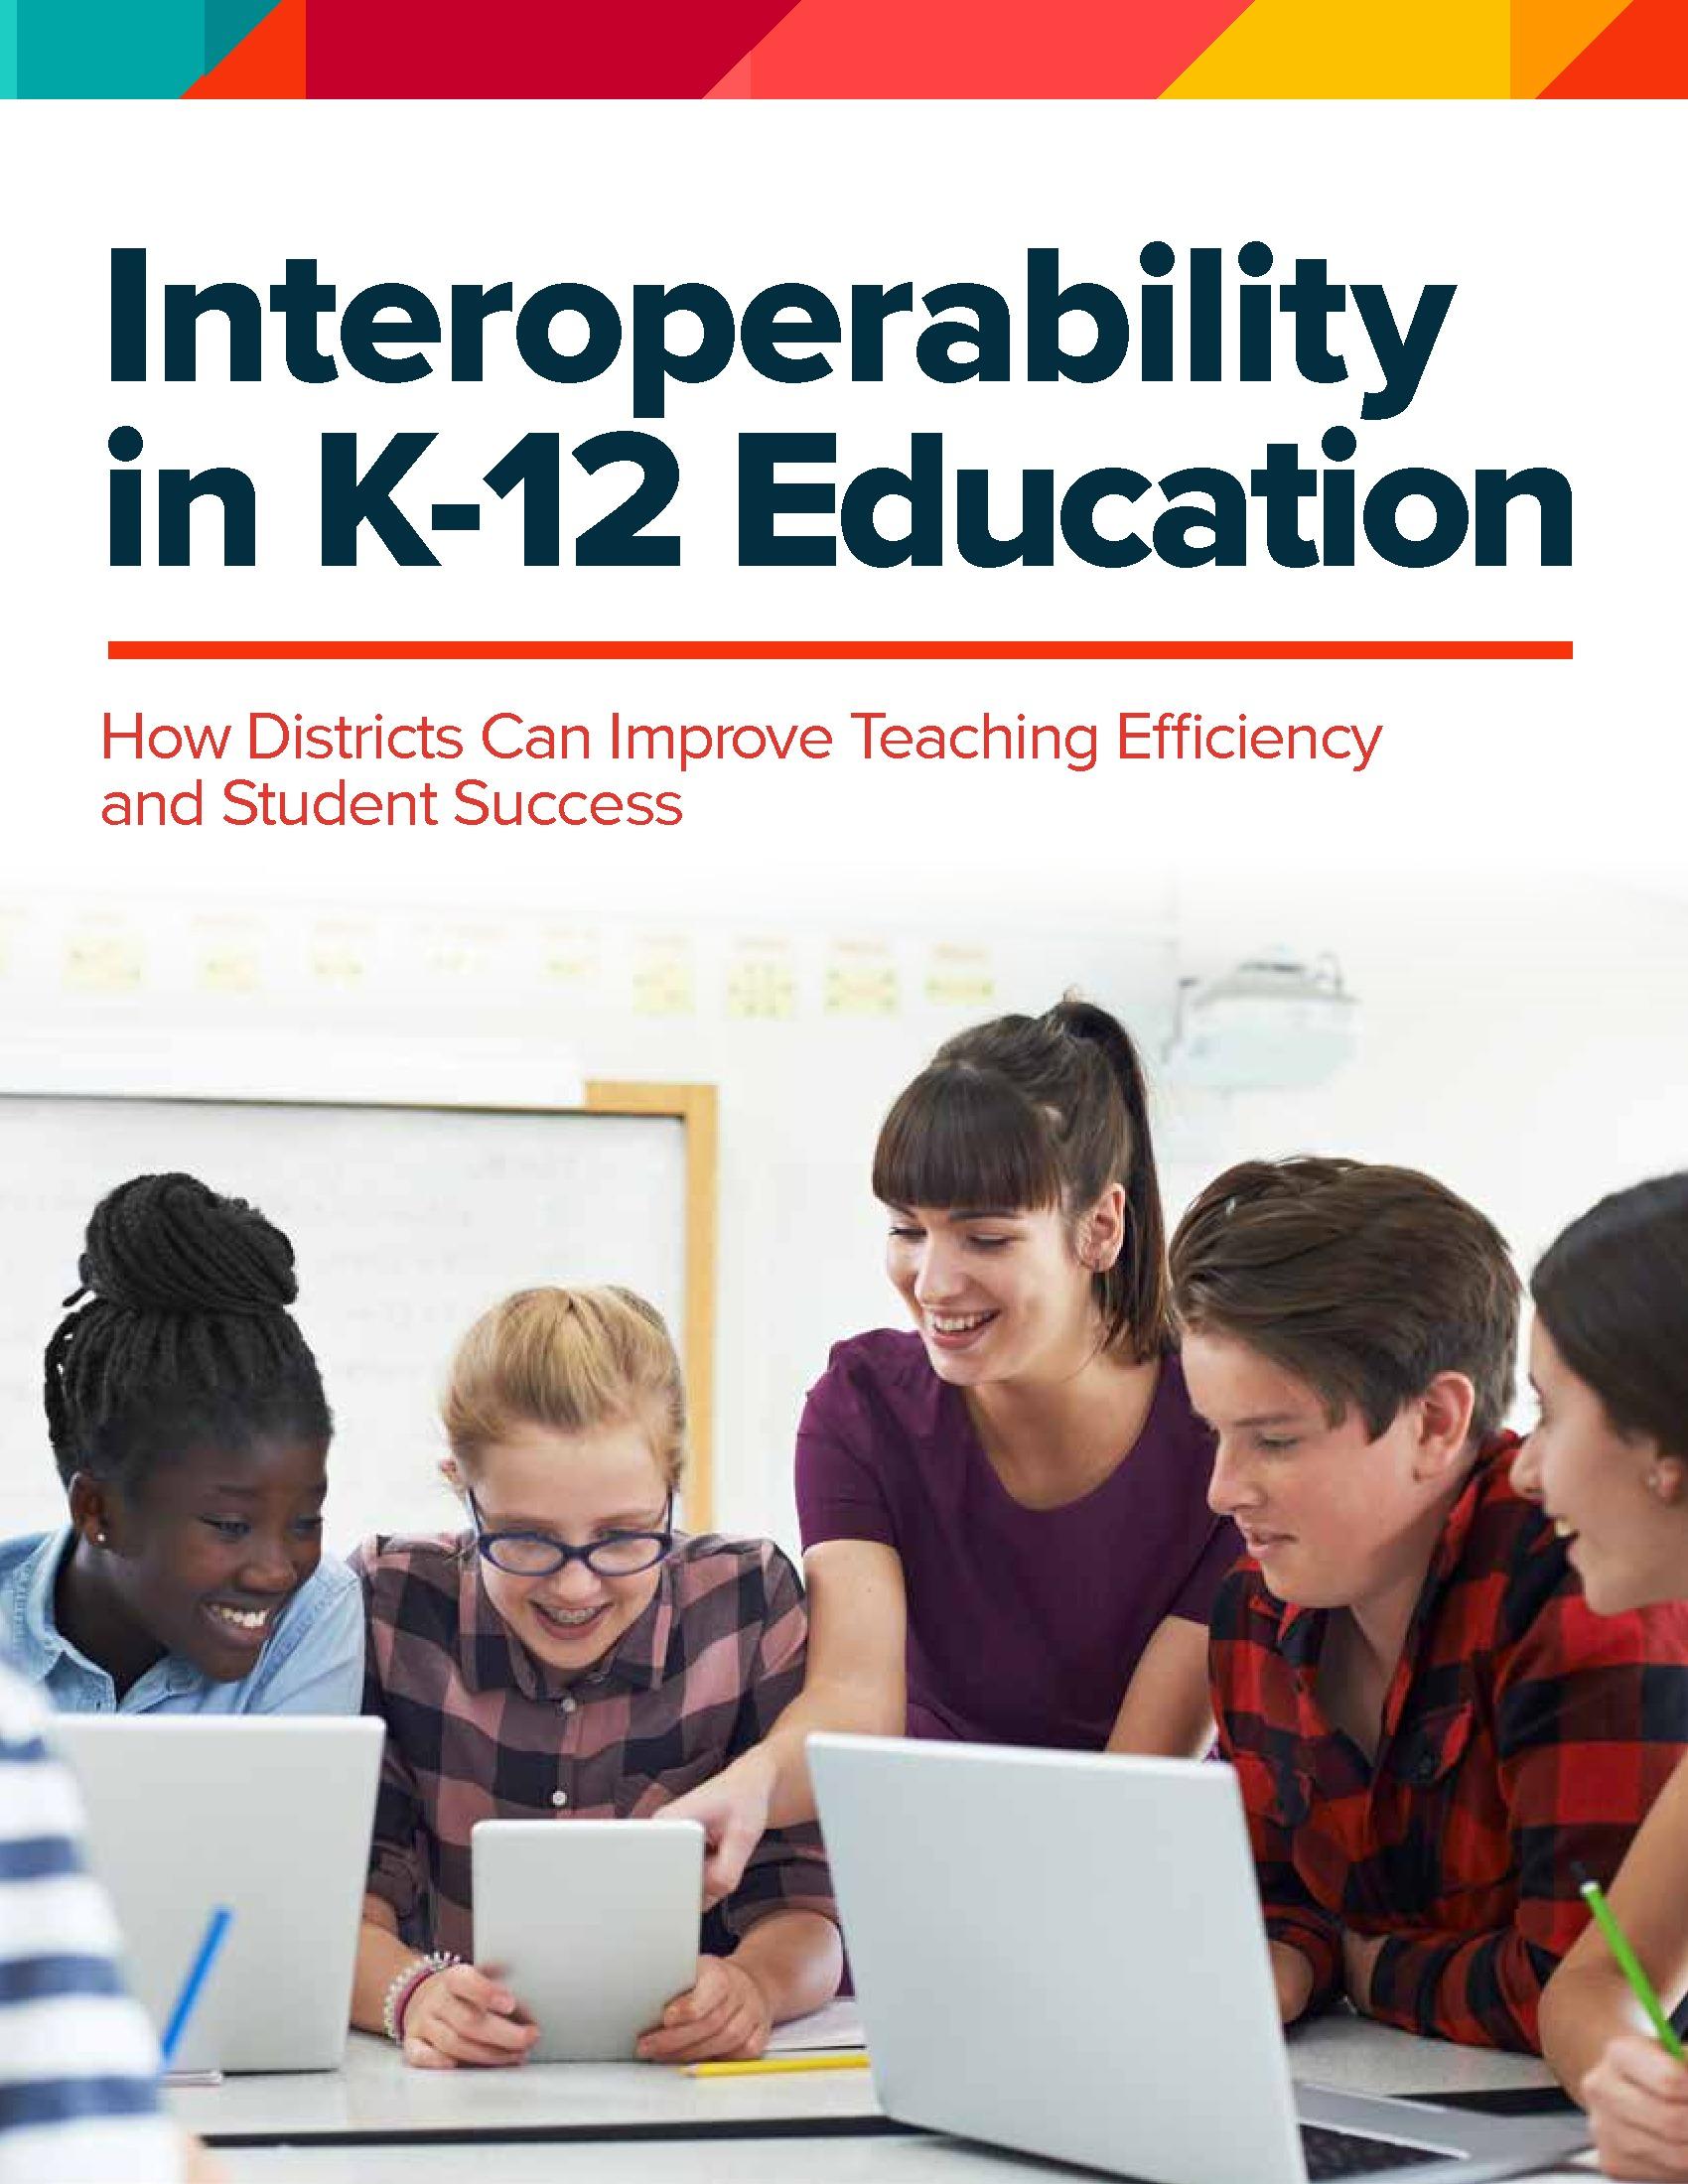 CDE - PowerSchool - Issue Brief - 180613 - Interoperability in K-12 Education